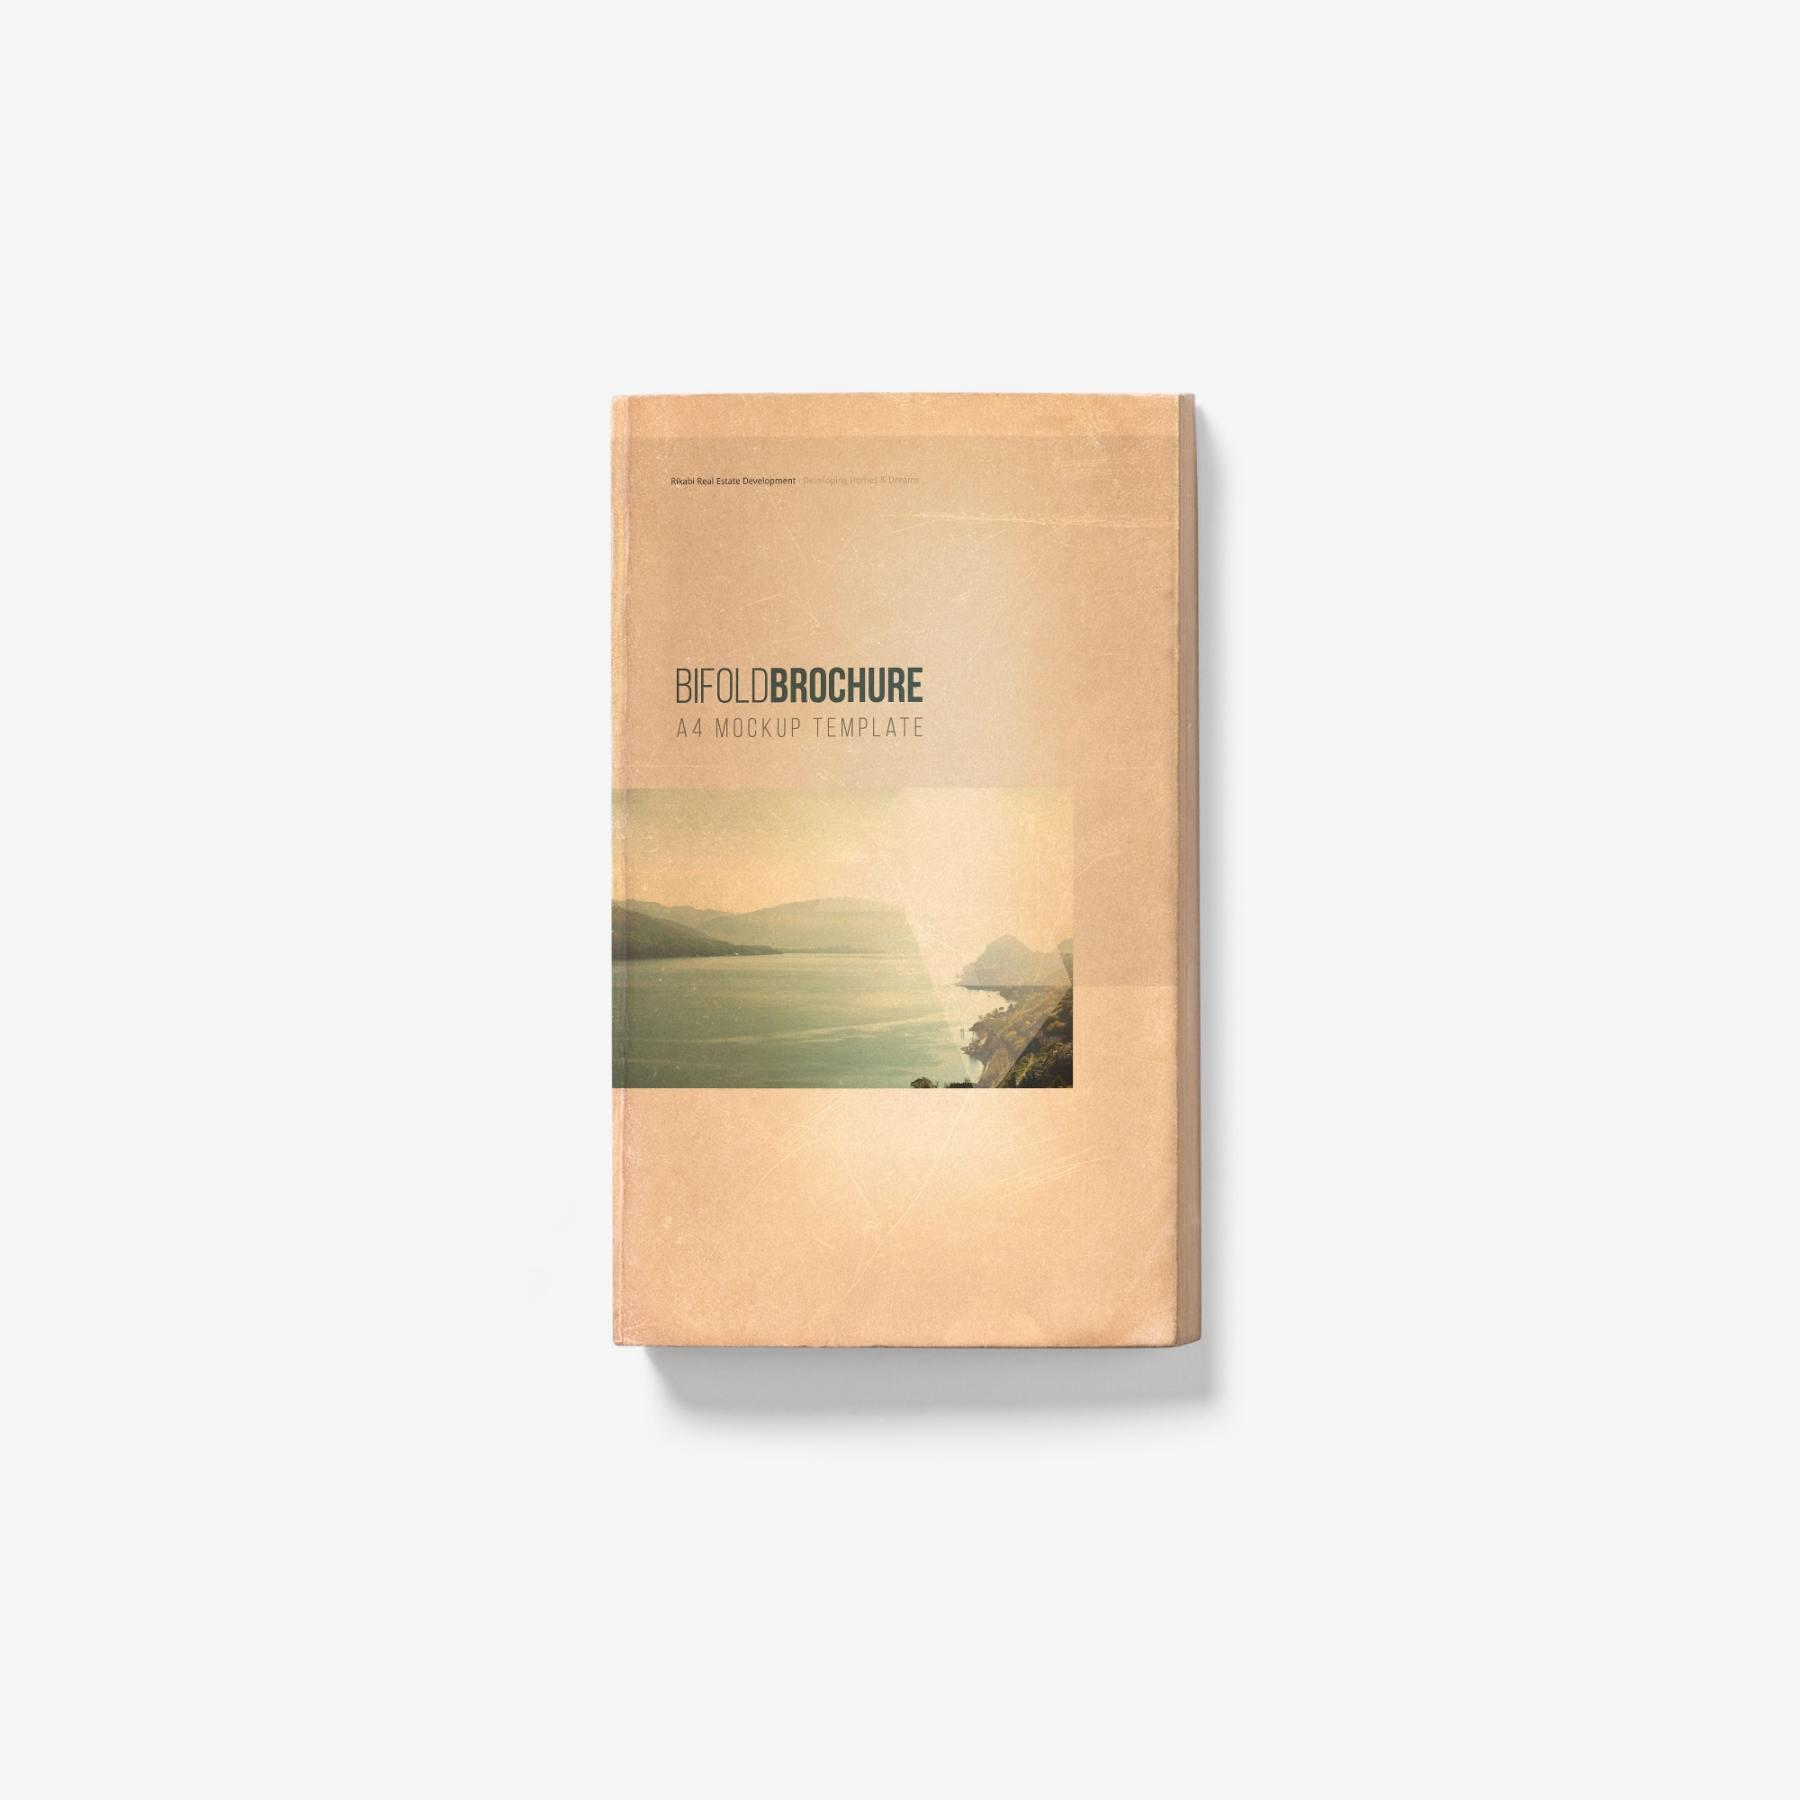 0aa048fdc04ef96 - 古朴平铺宣传书籍画册样机